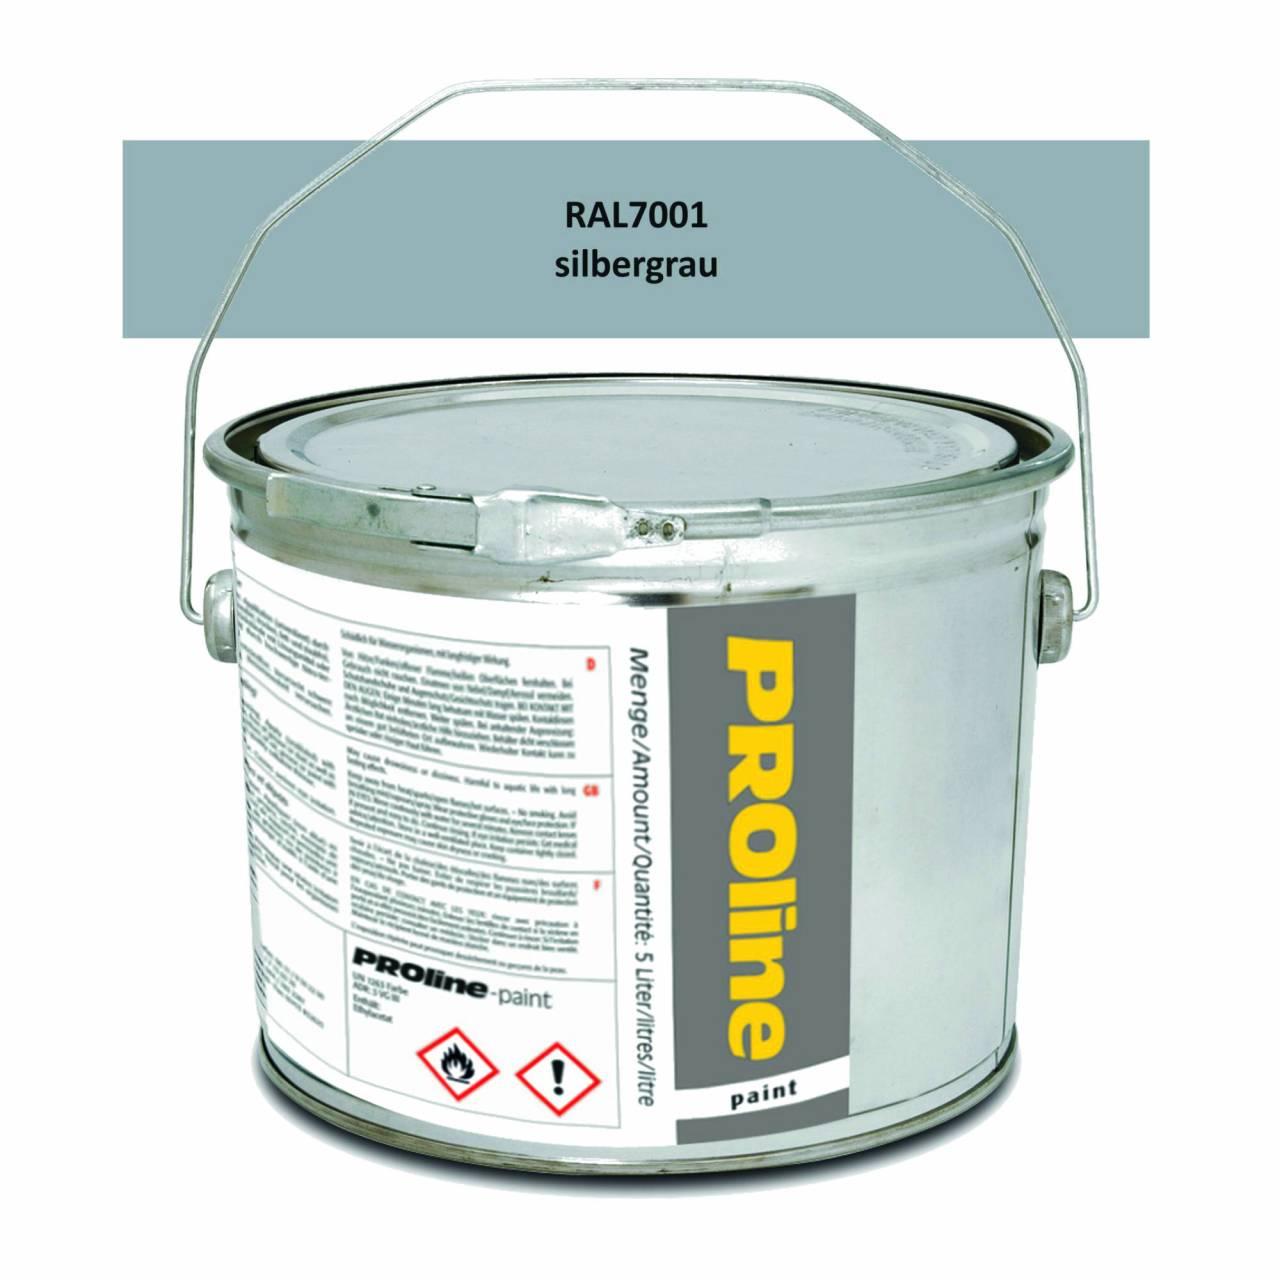 Hallen-Markierfarbe 'PROline-paint' SILBERGRAU / Eimer a 5,0 Liter